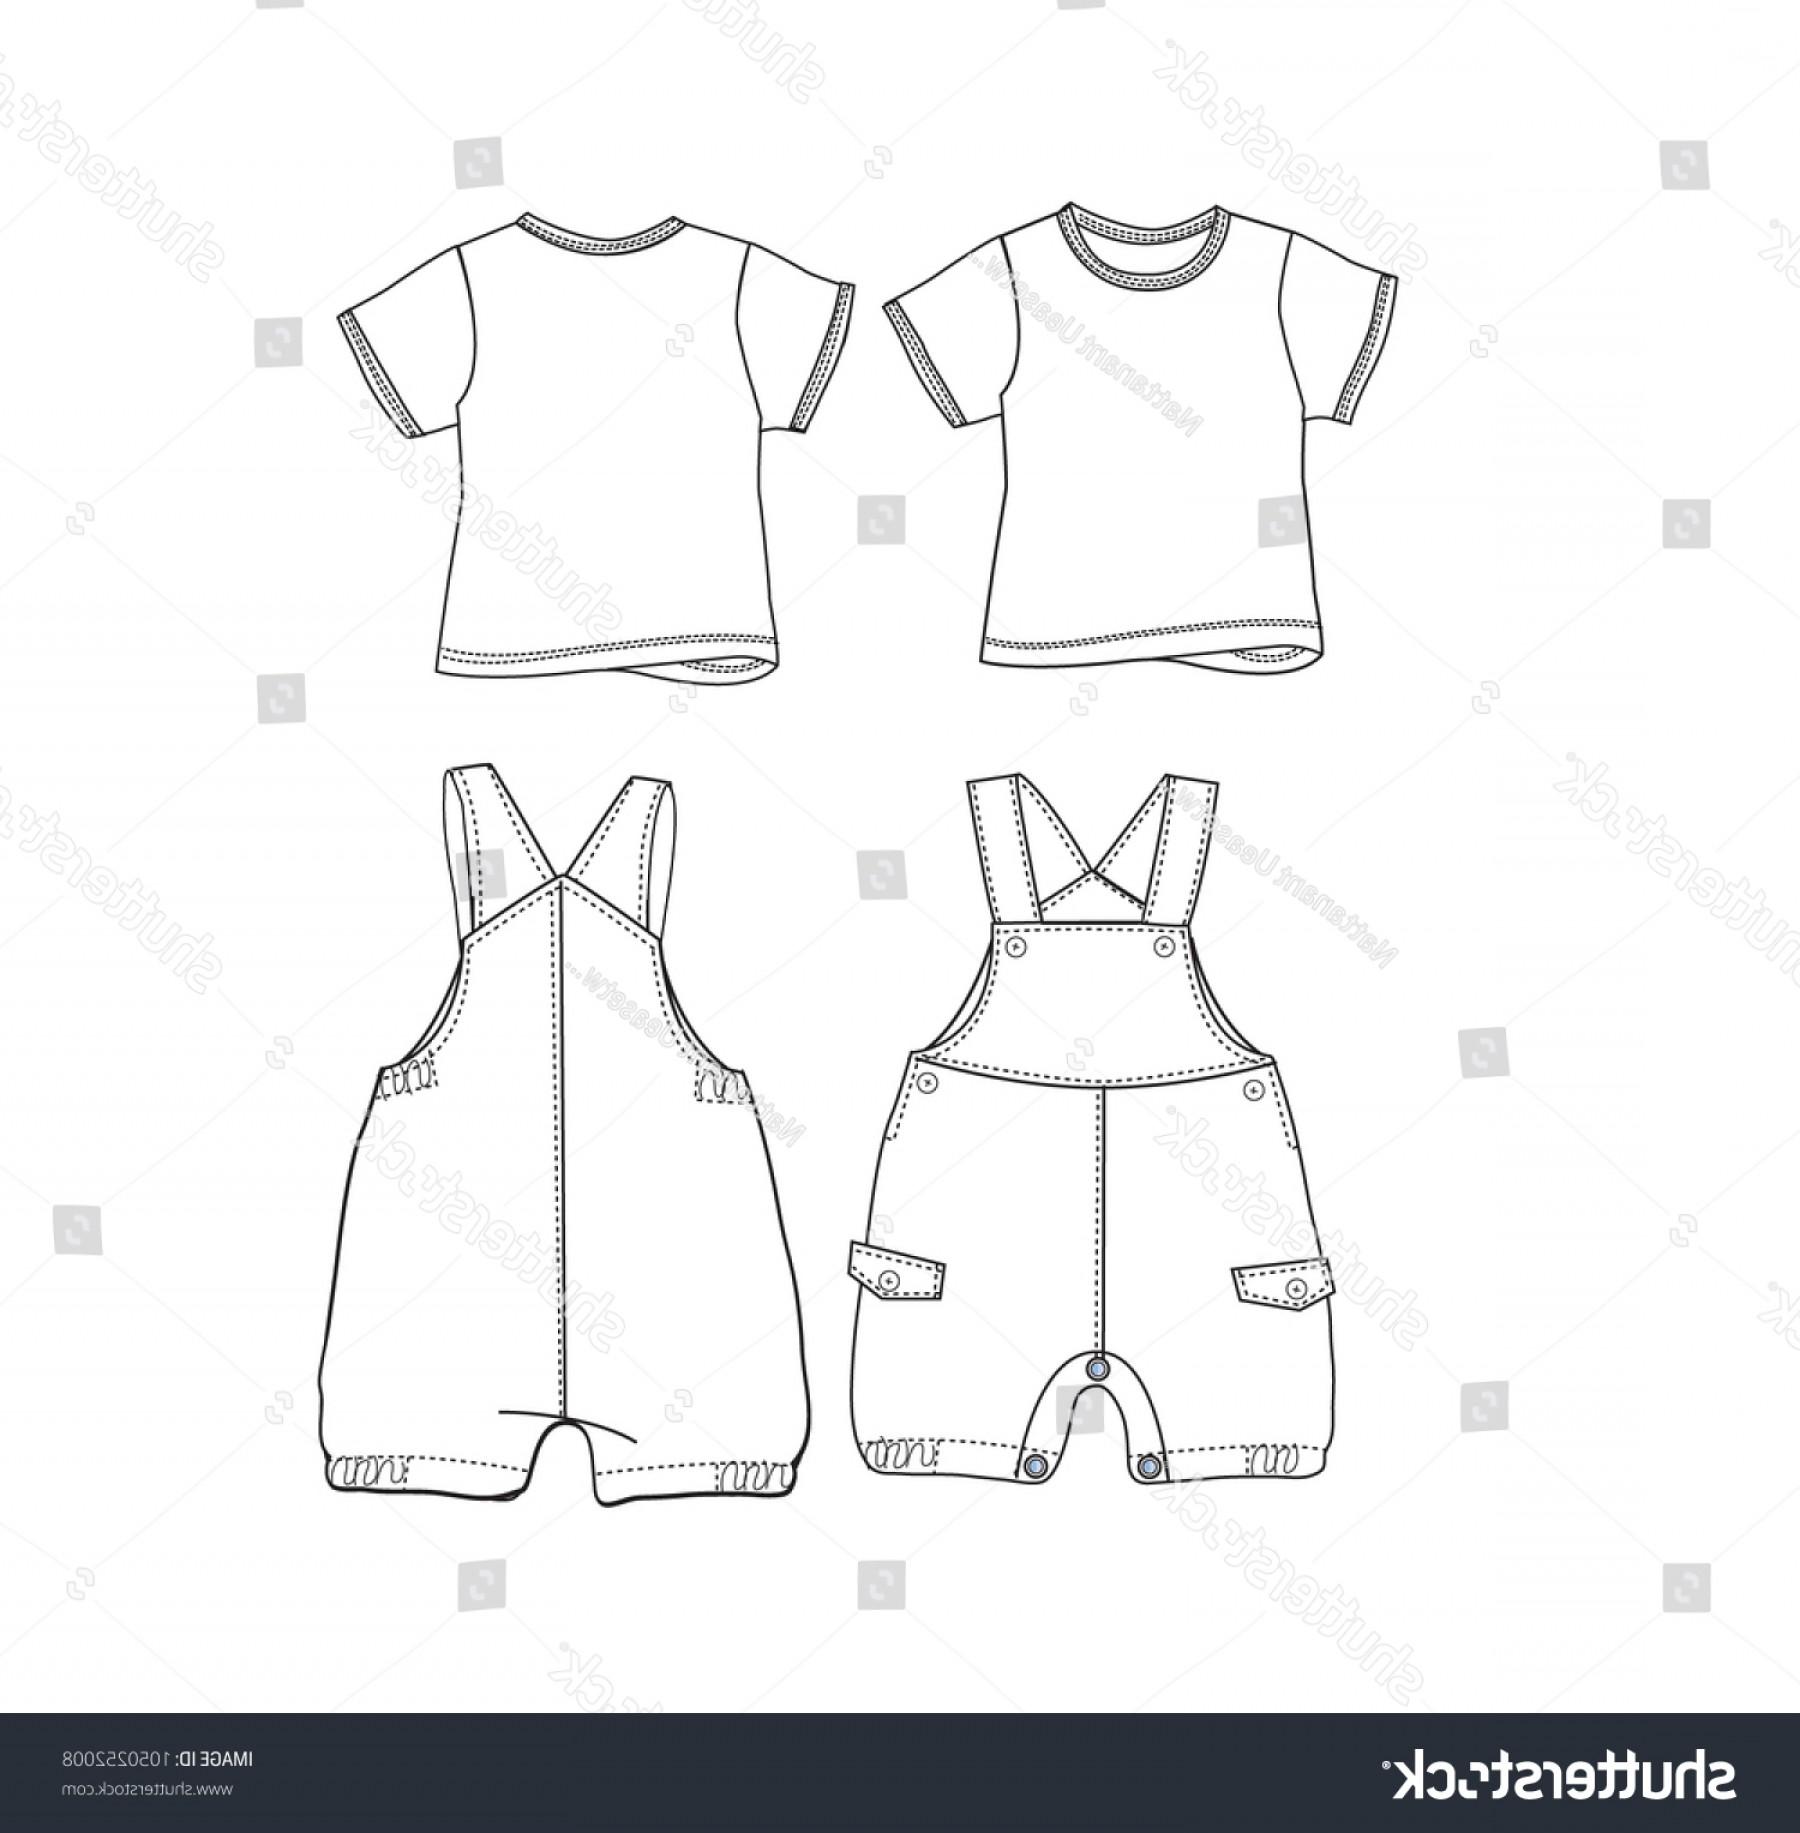 1800x1833 Tshirt Jumper Vector Design Template Baby Shopatcloth